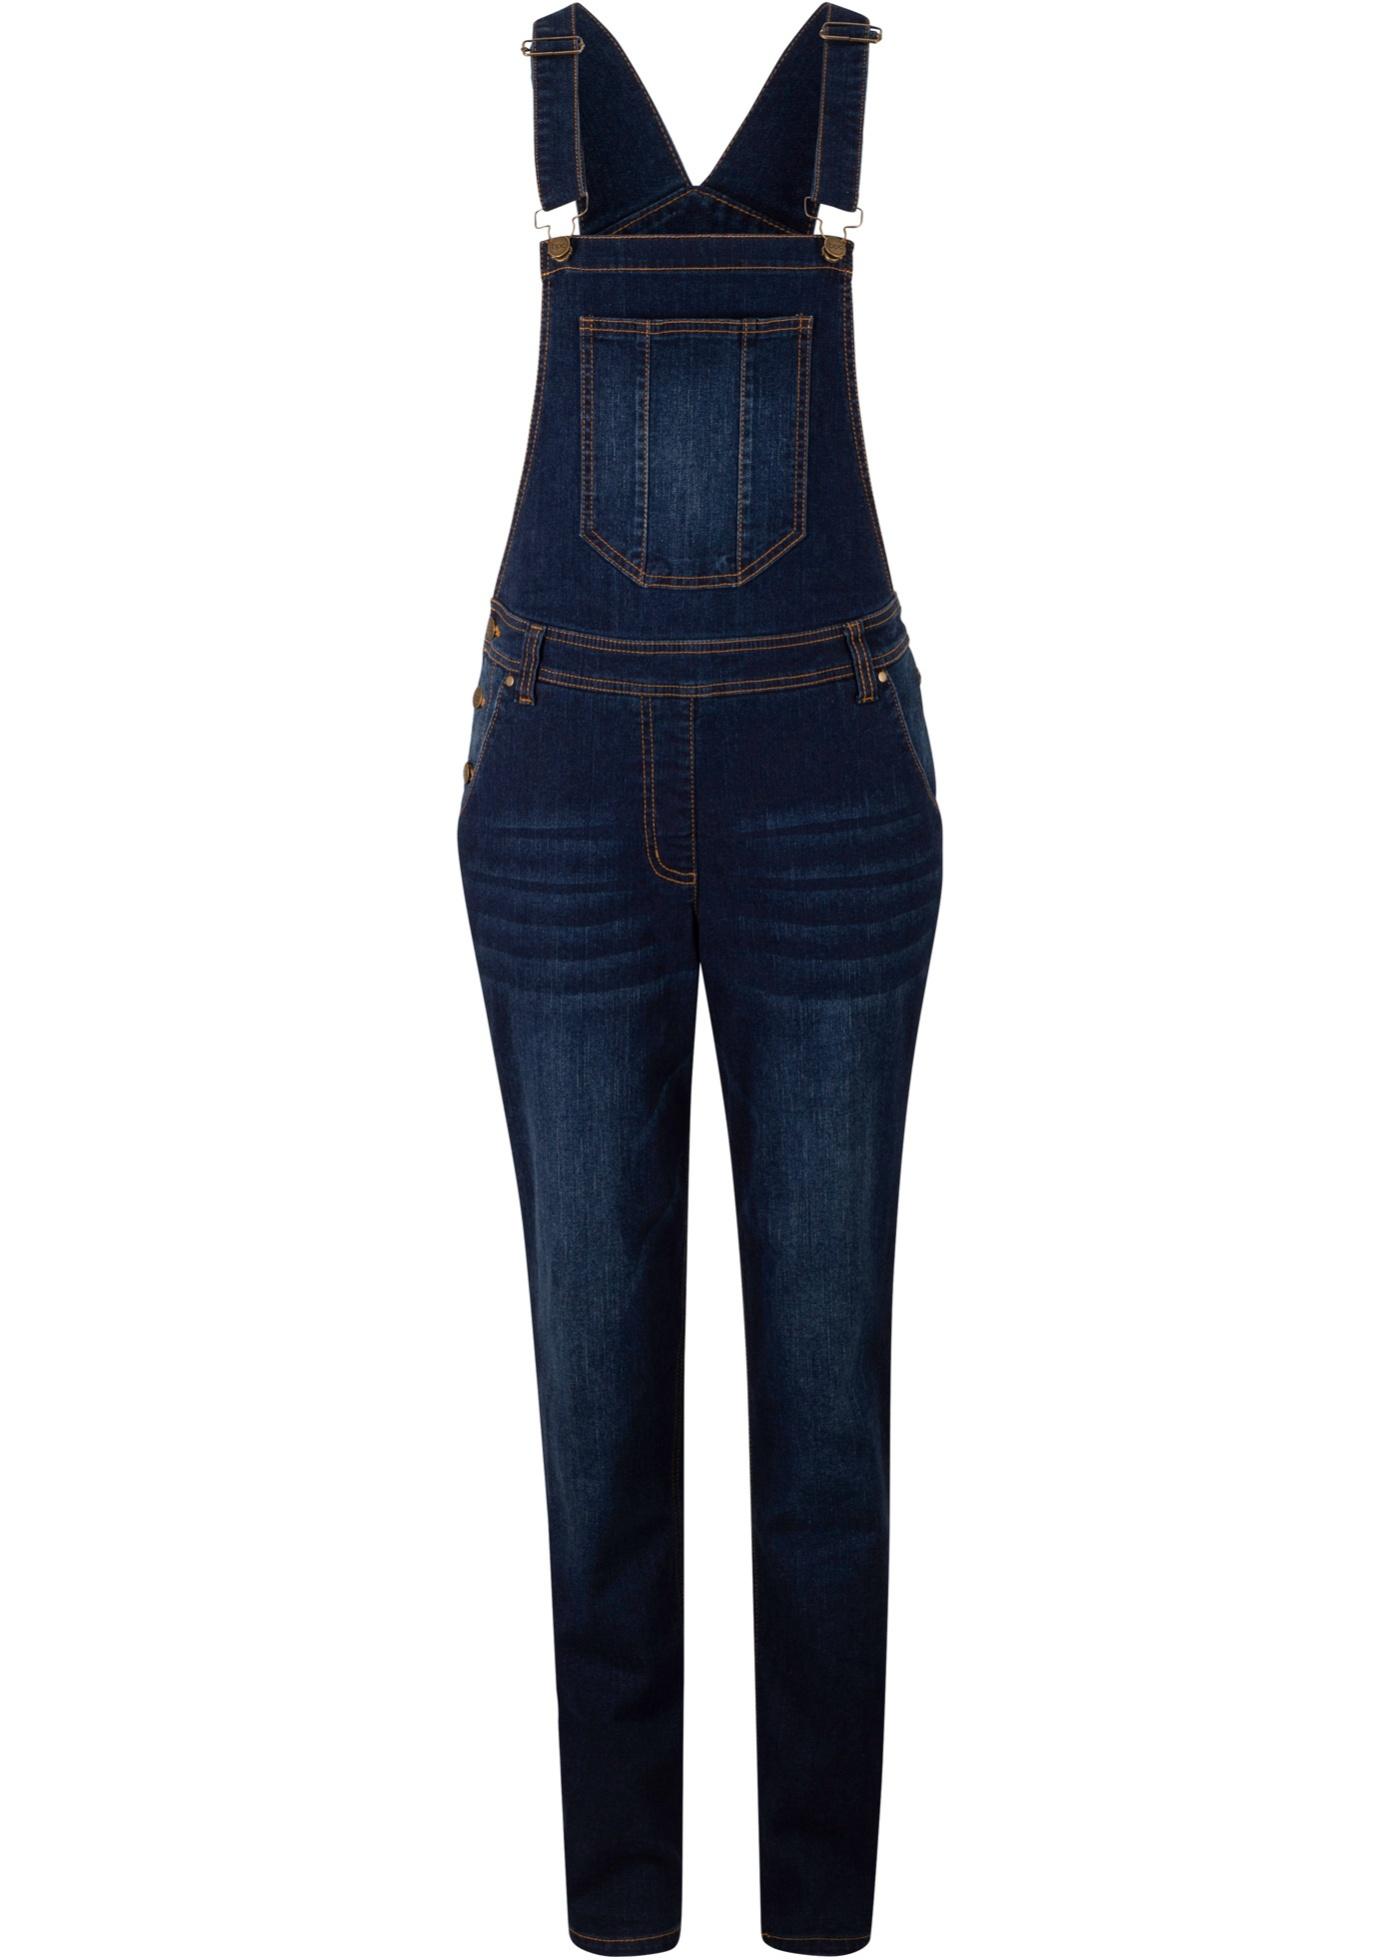 Hosen - Jeans Latzhose mit extra Weite › bonprix › schwarz  - Onlineshop Bonprix